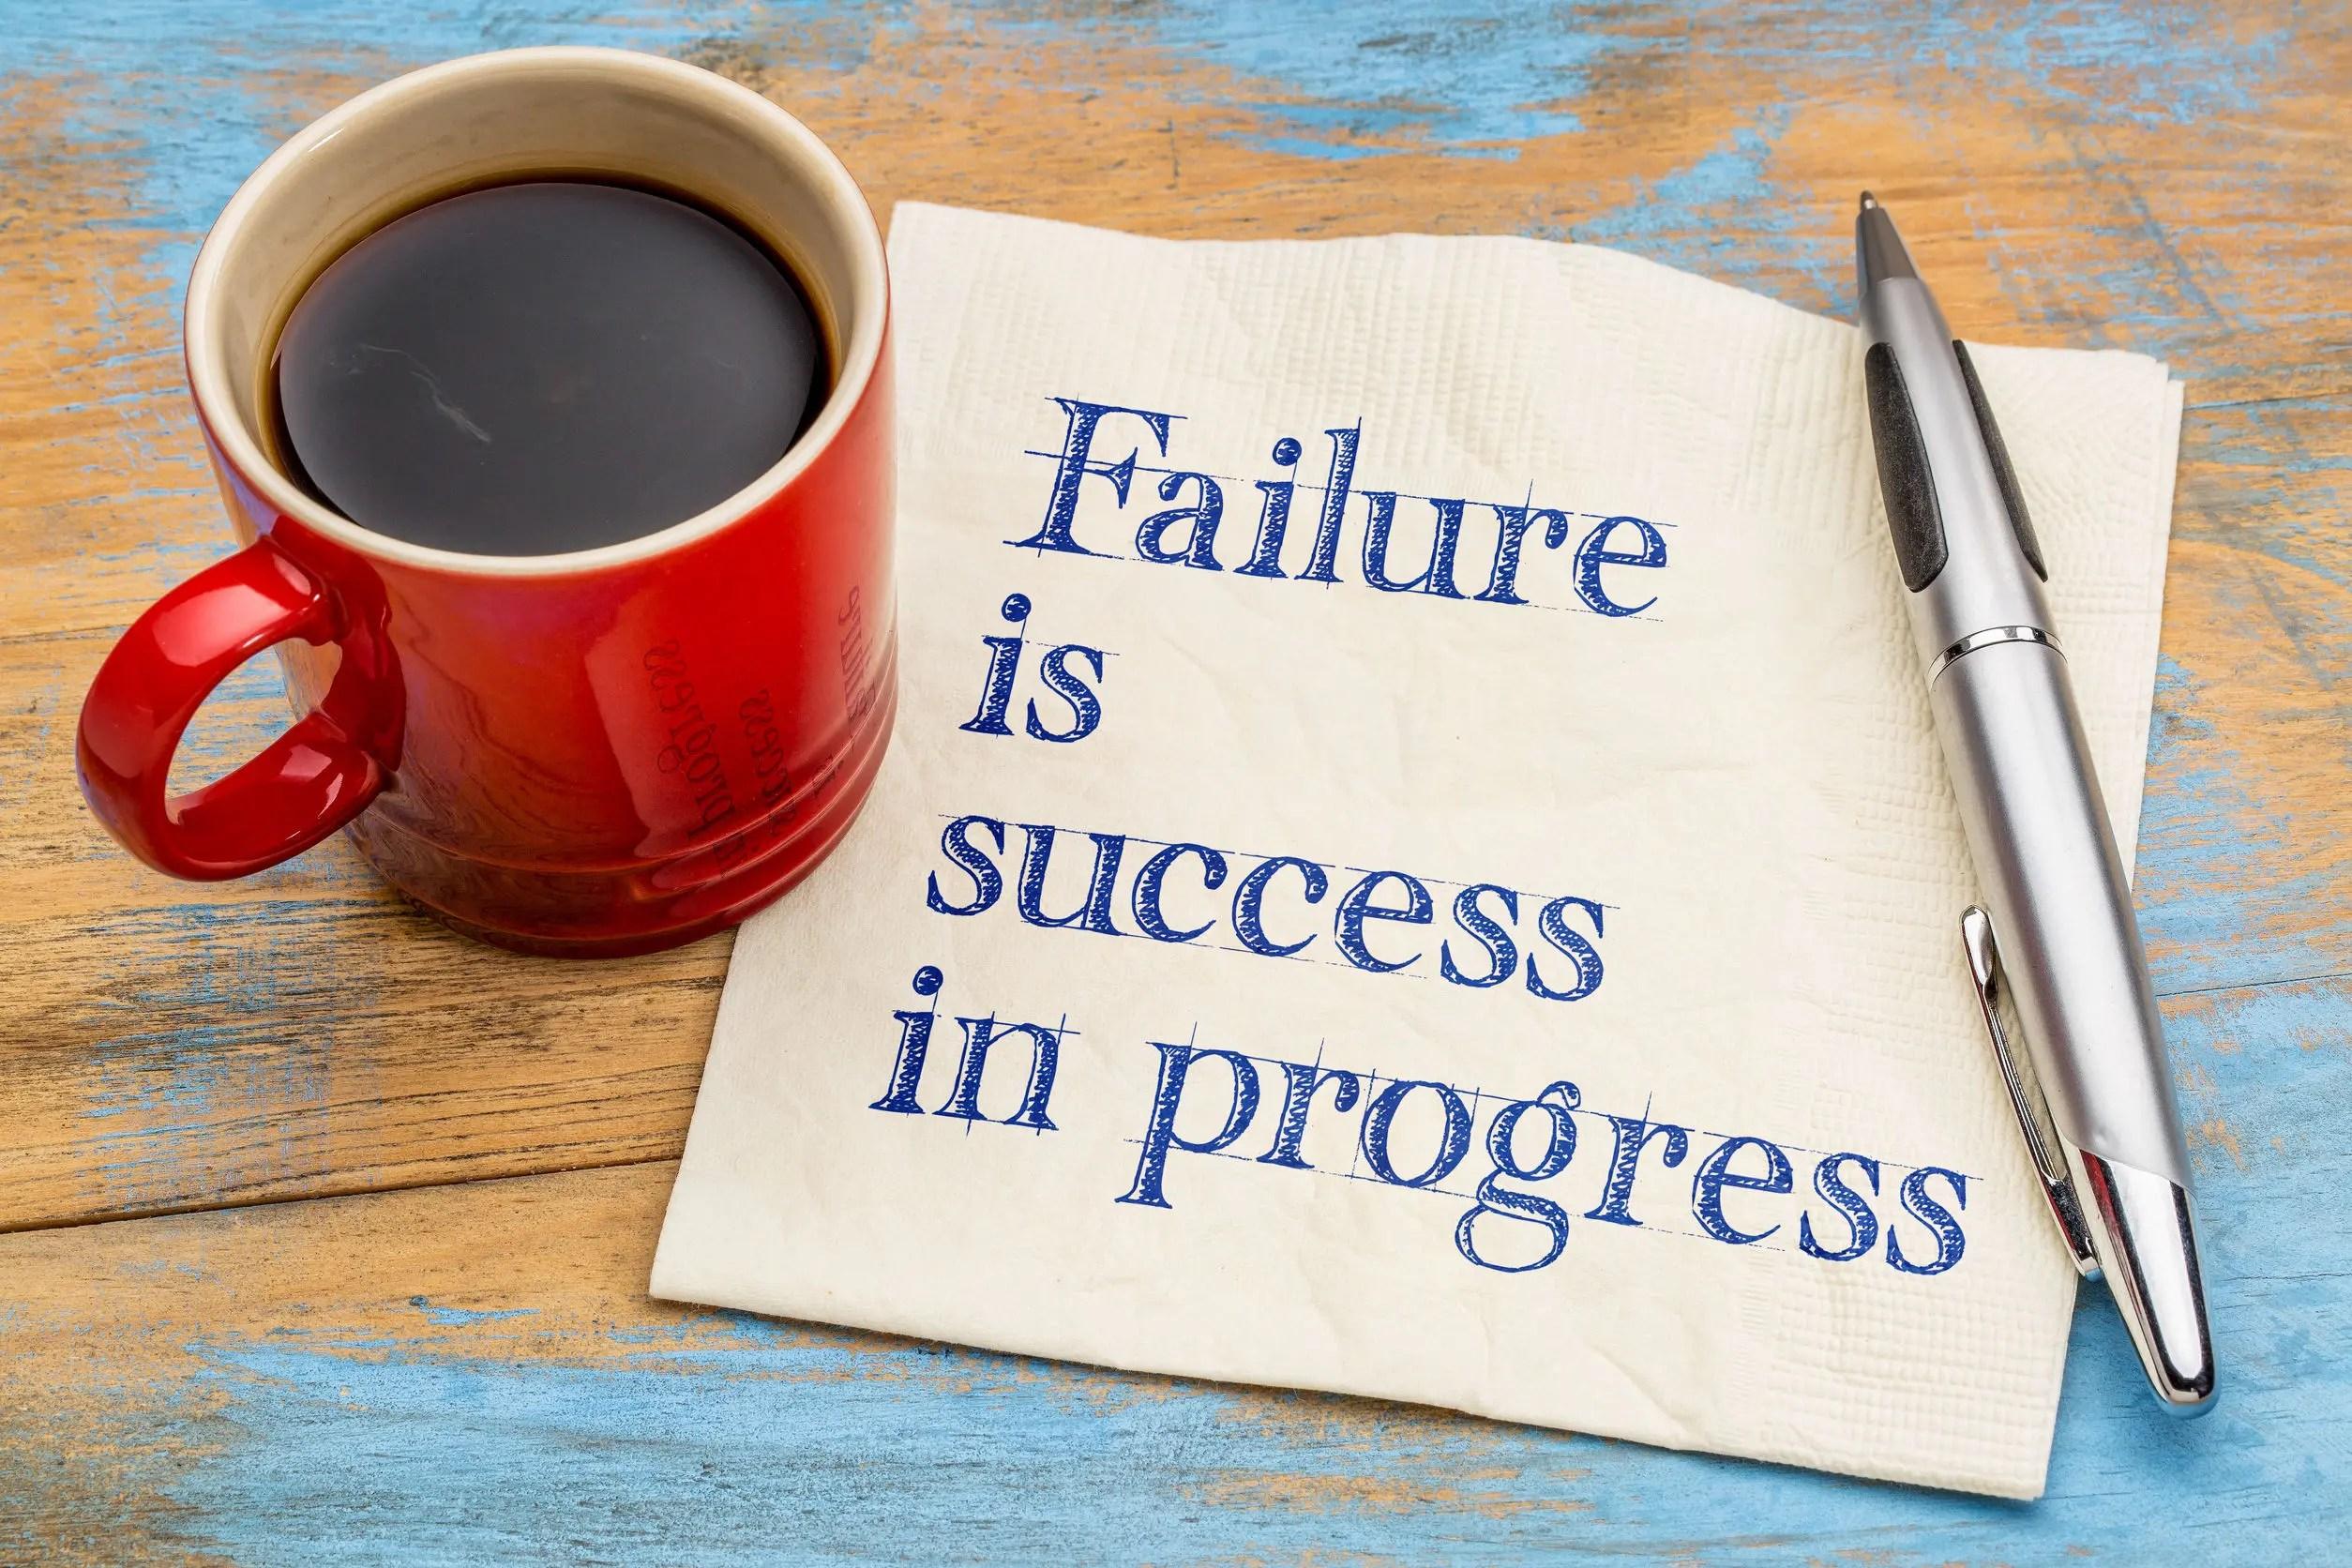 Failure is success in progress